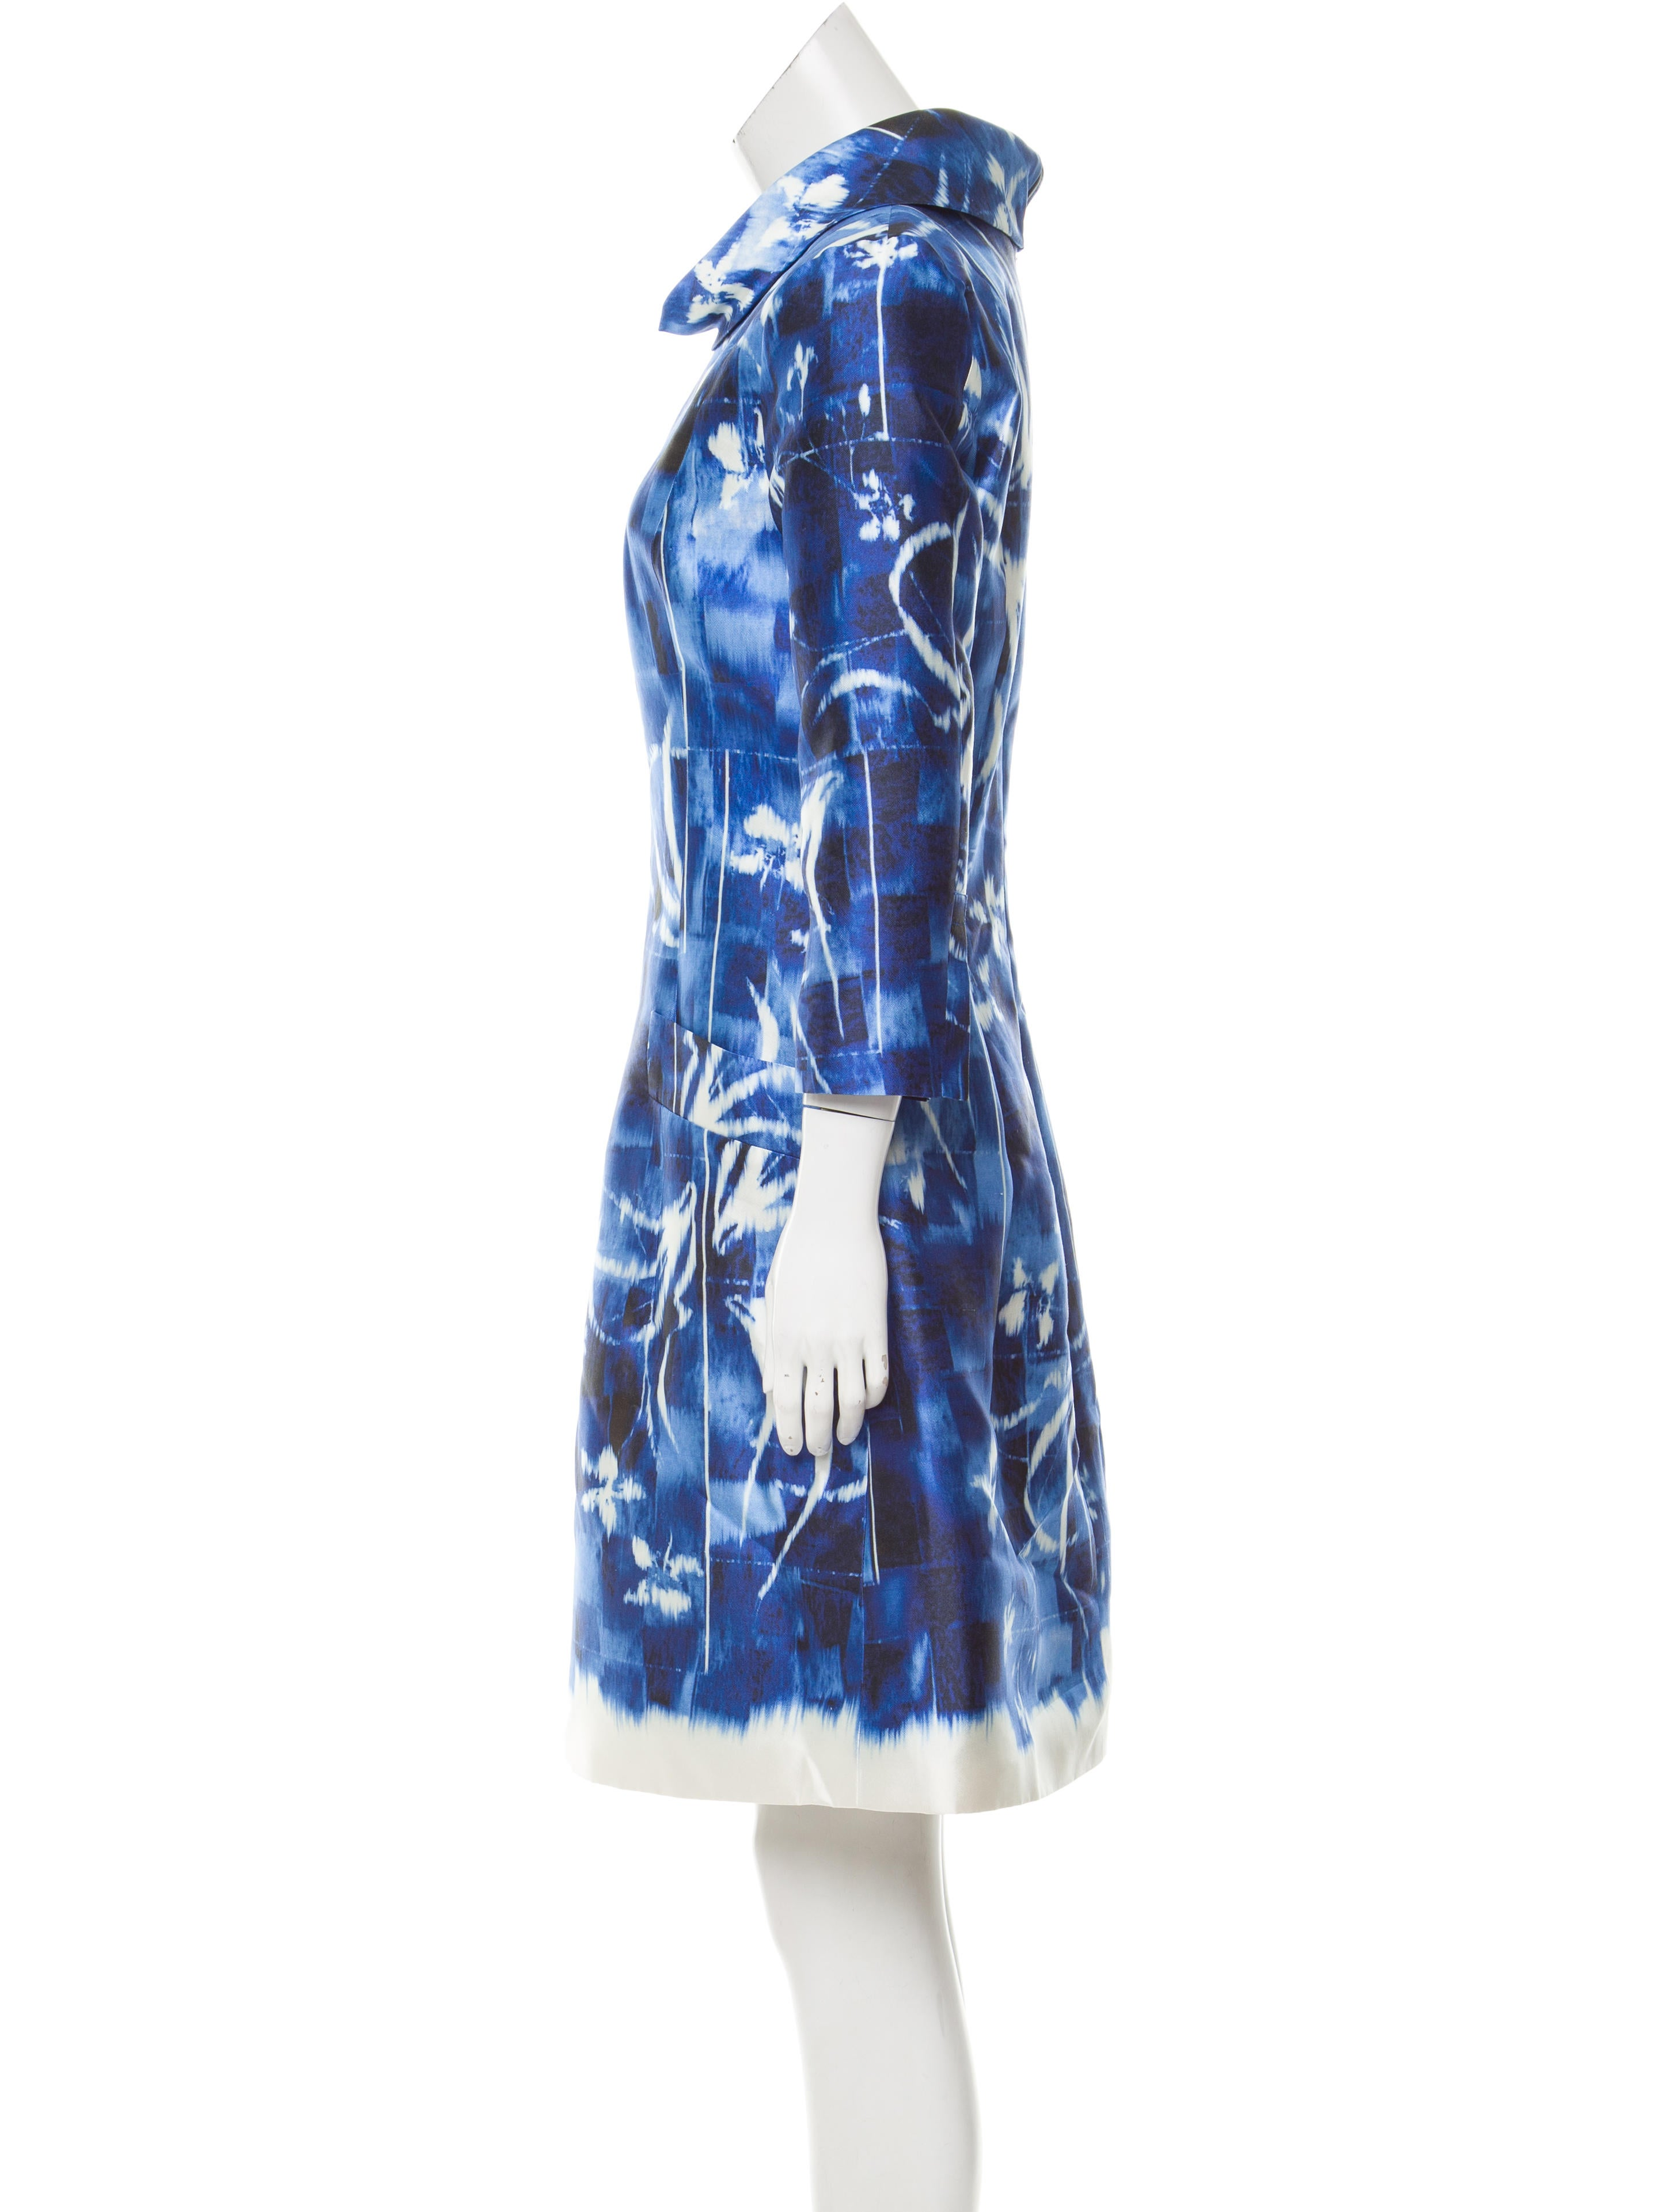 Oscar de la renta silk blend abstract dress clothing for Oscar de la renta candles